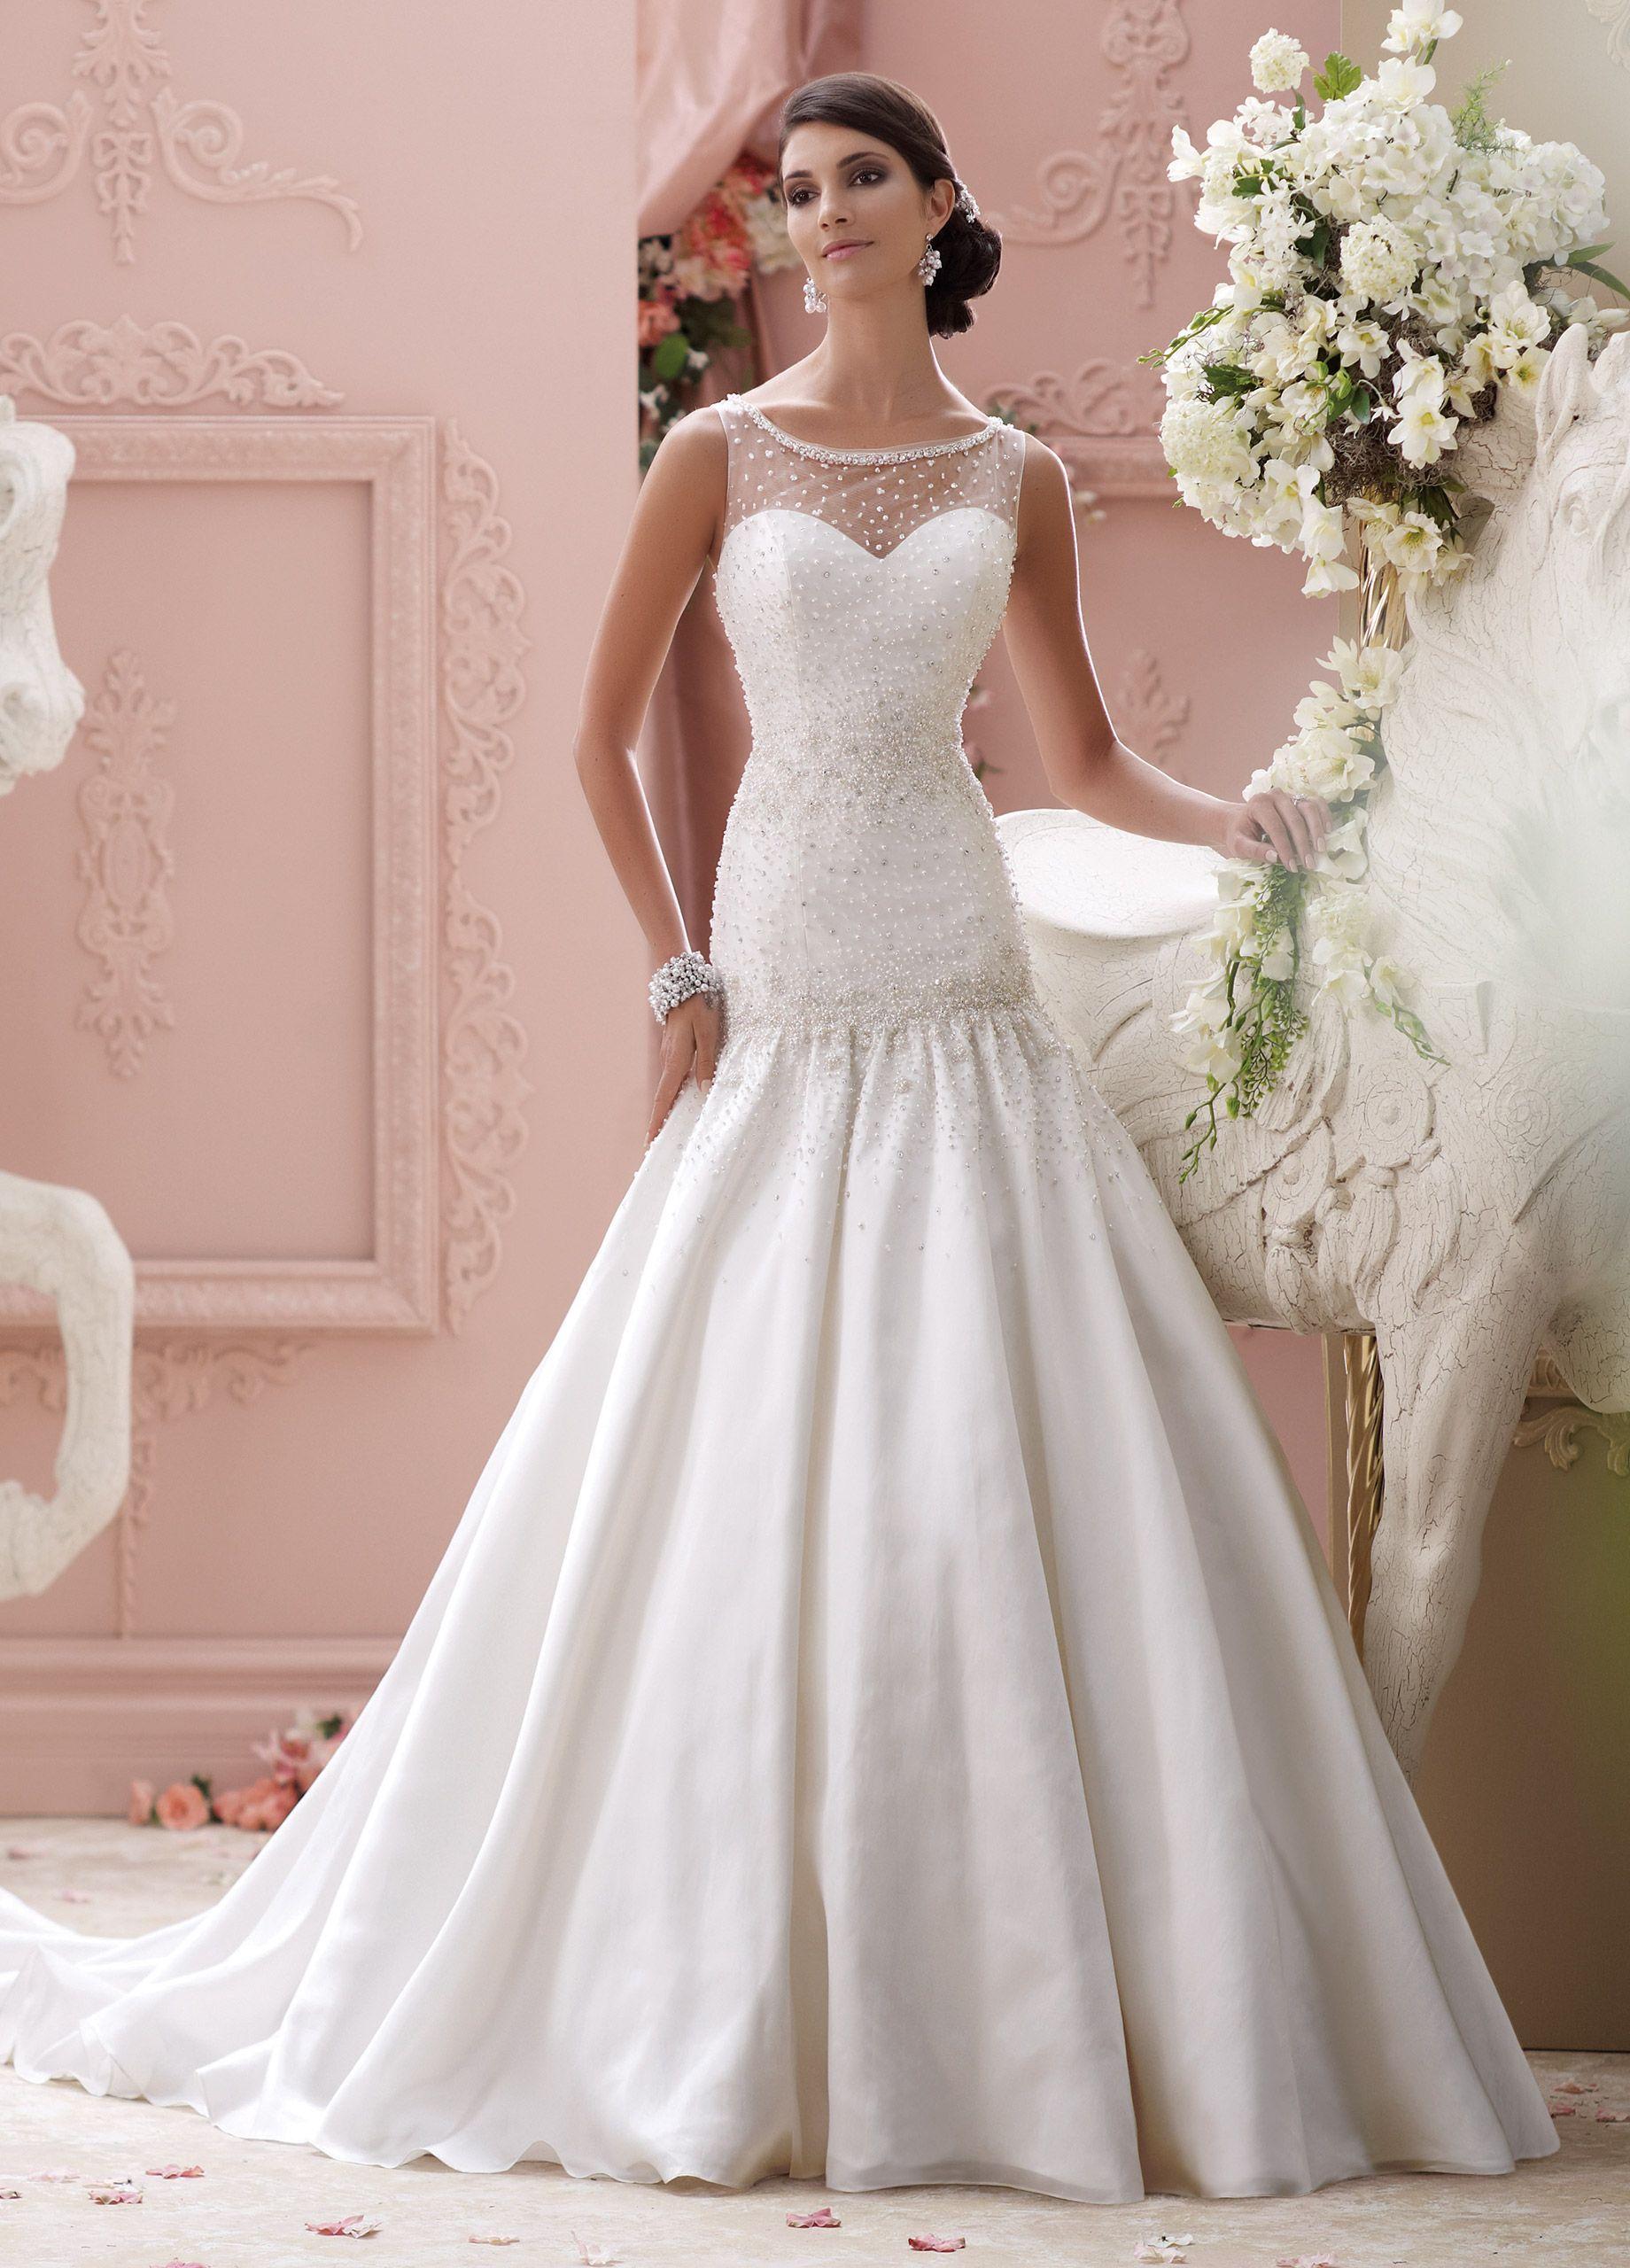 Trumpet style wedding dresses  Unique Wedding Dresses Spring   Martin Thornburg  Trumpet